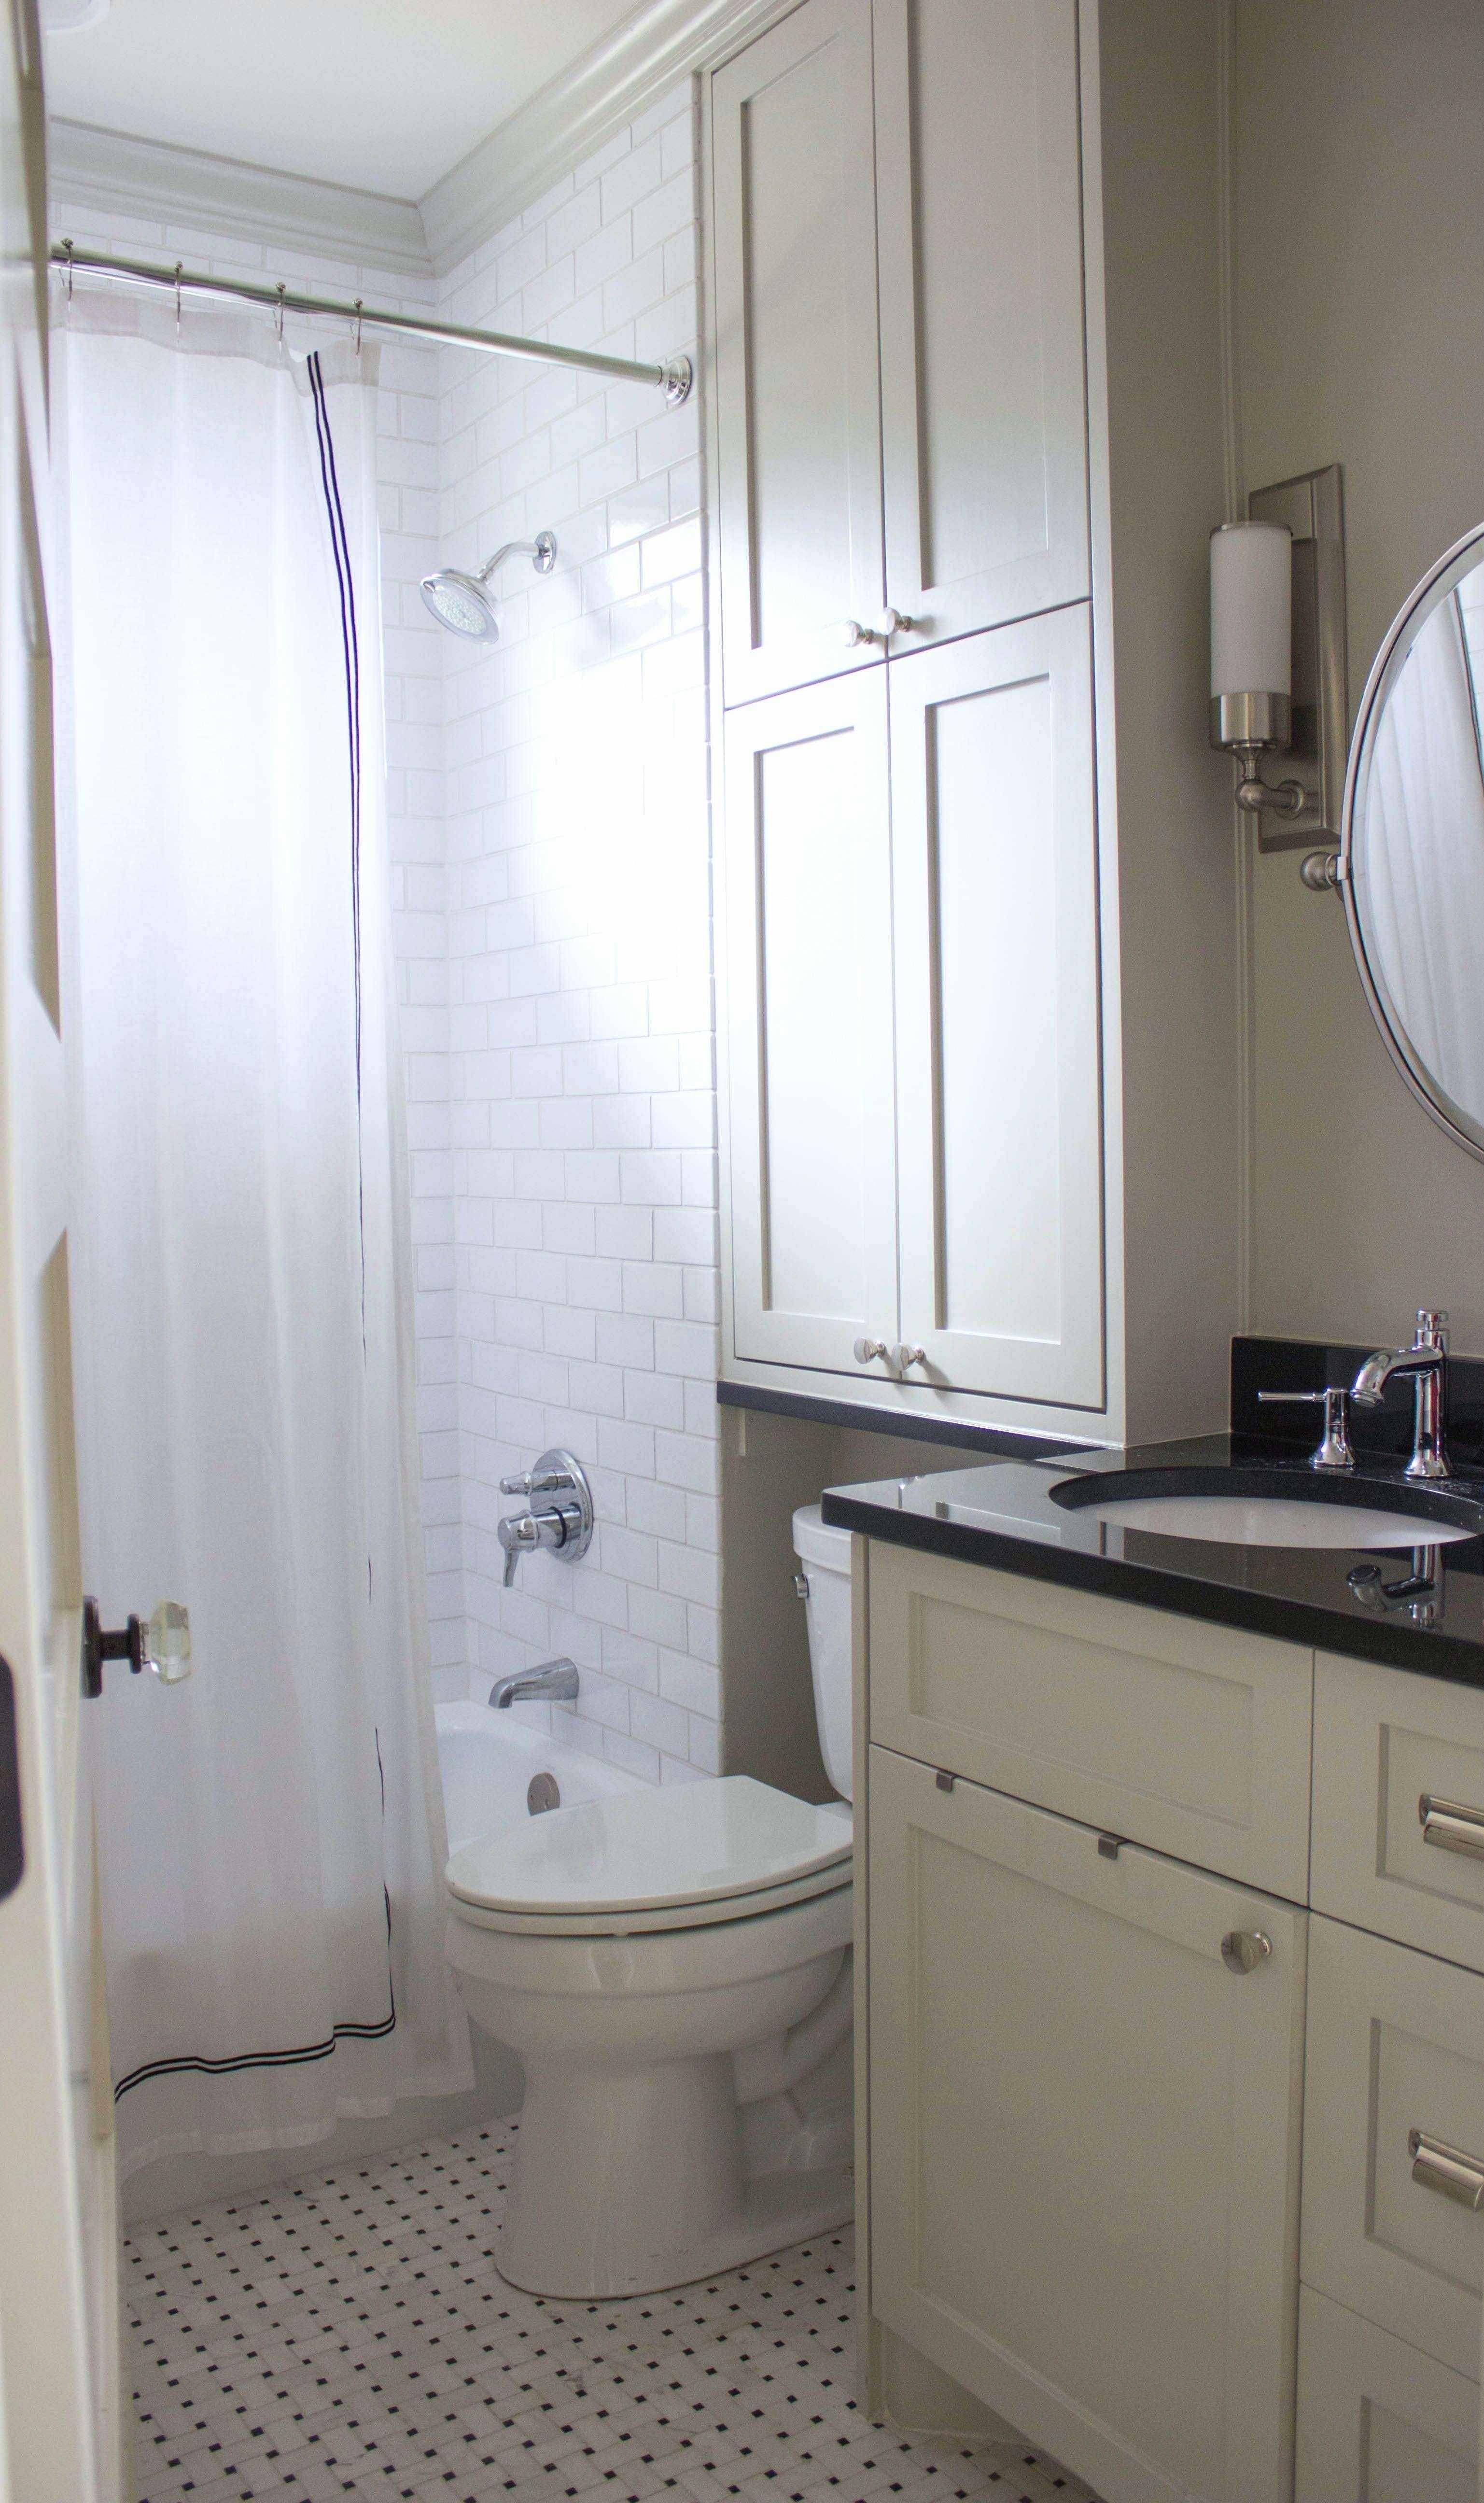 Orangize Bathroom Bathroom Cabinets Target Bathroom Accessories